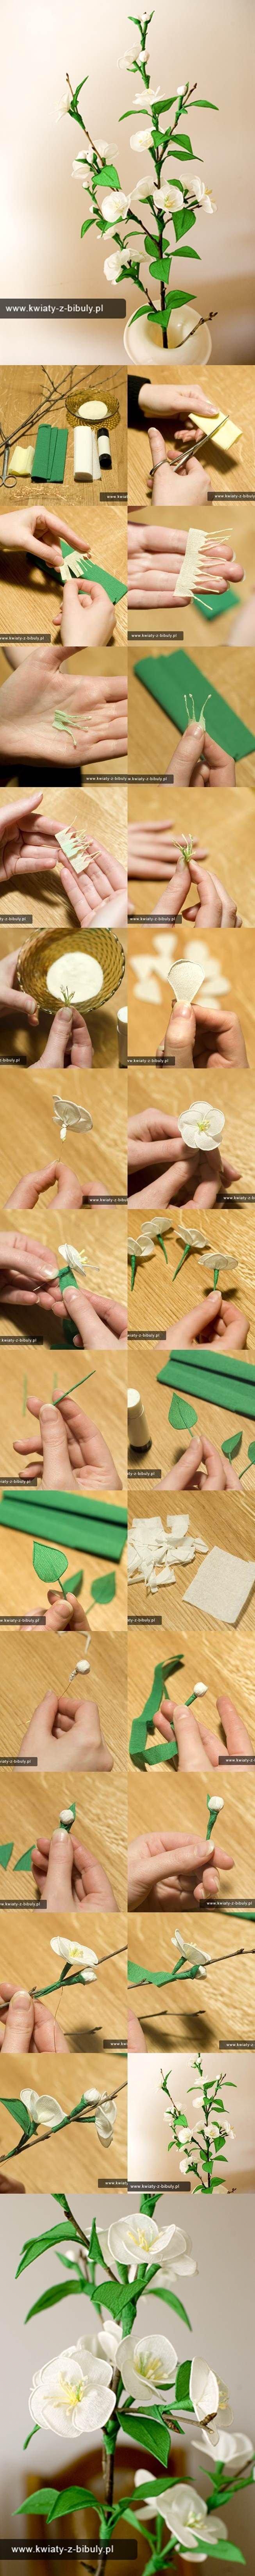 DIY Delicate Crepe Paper Cherry Blossom Sprig 2